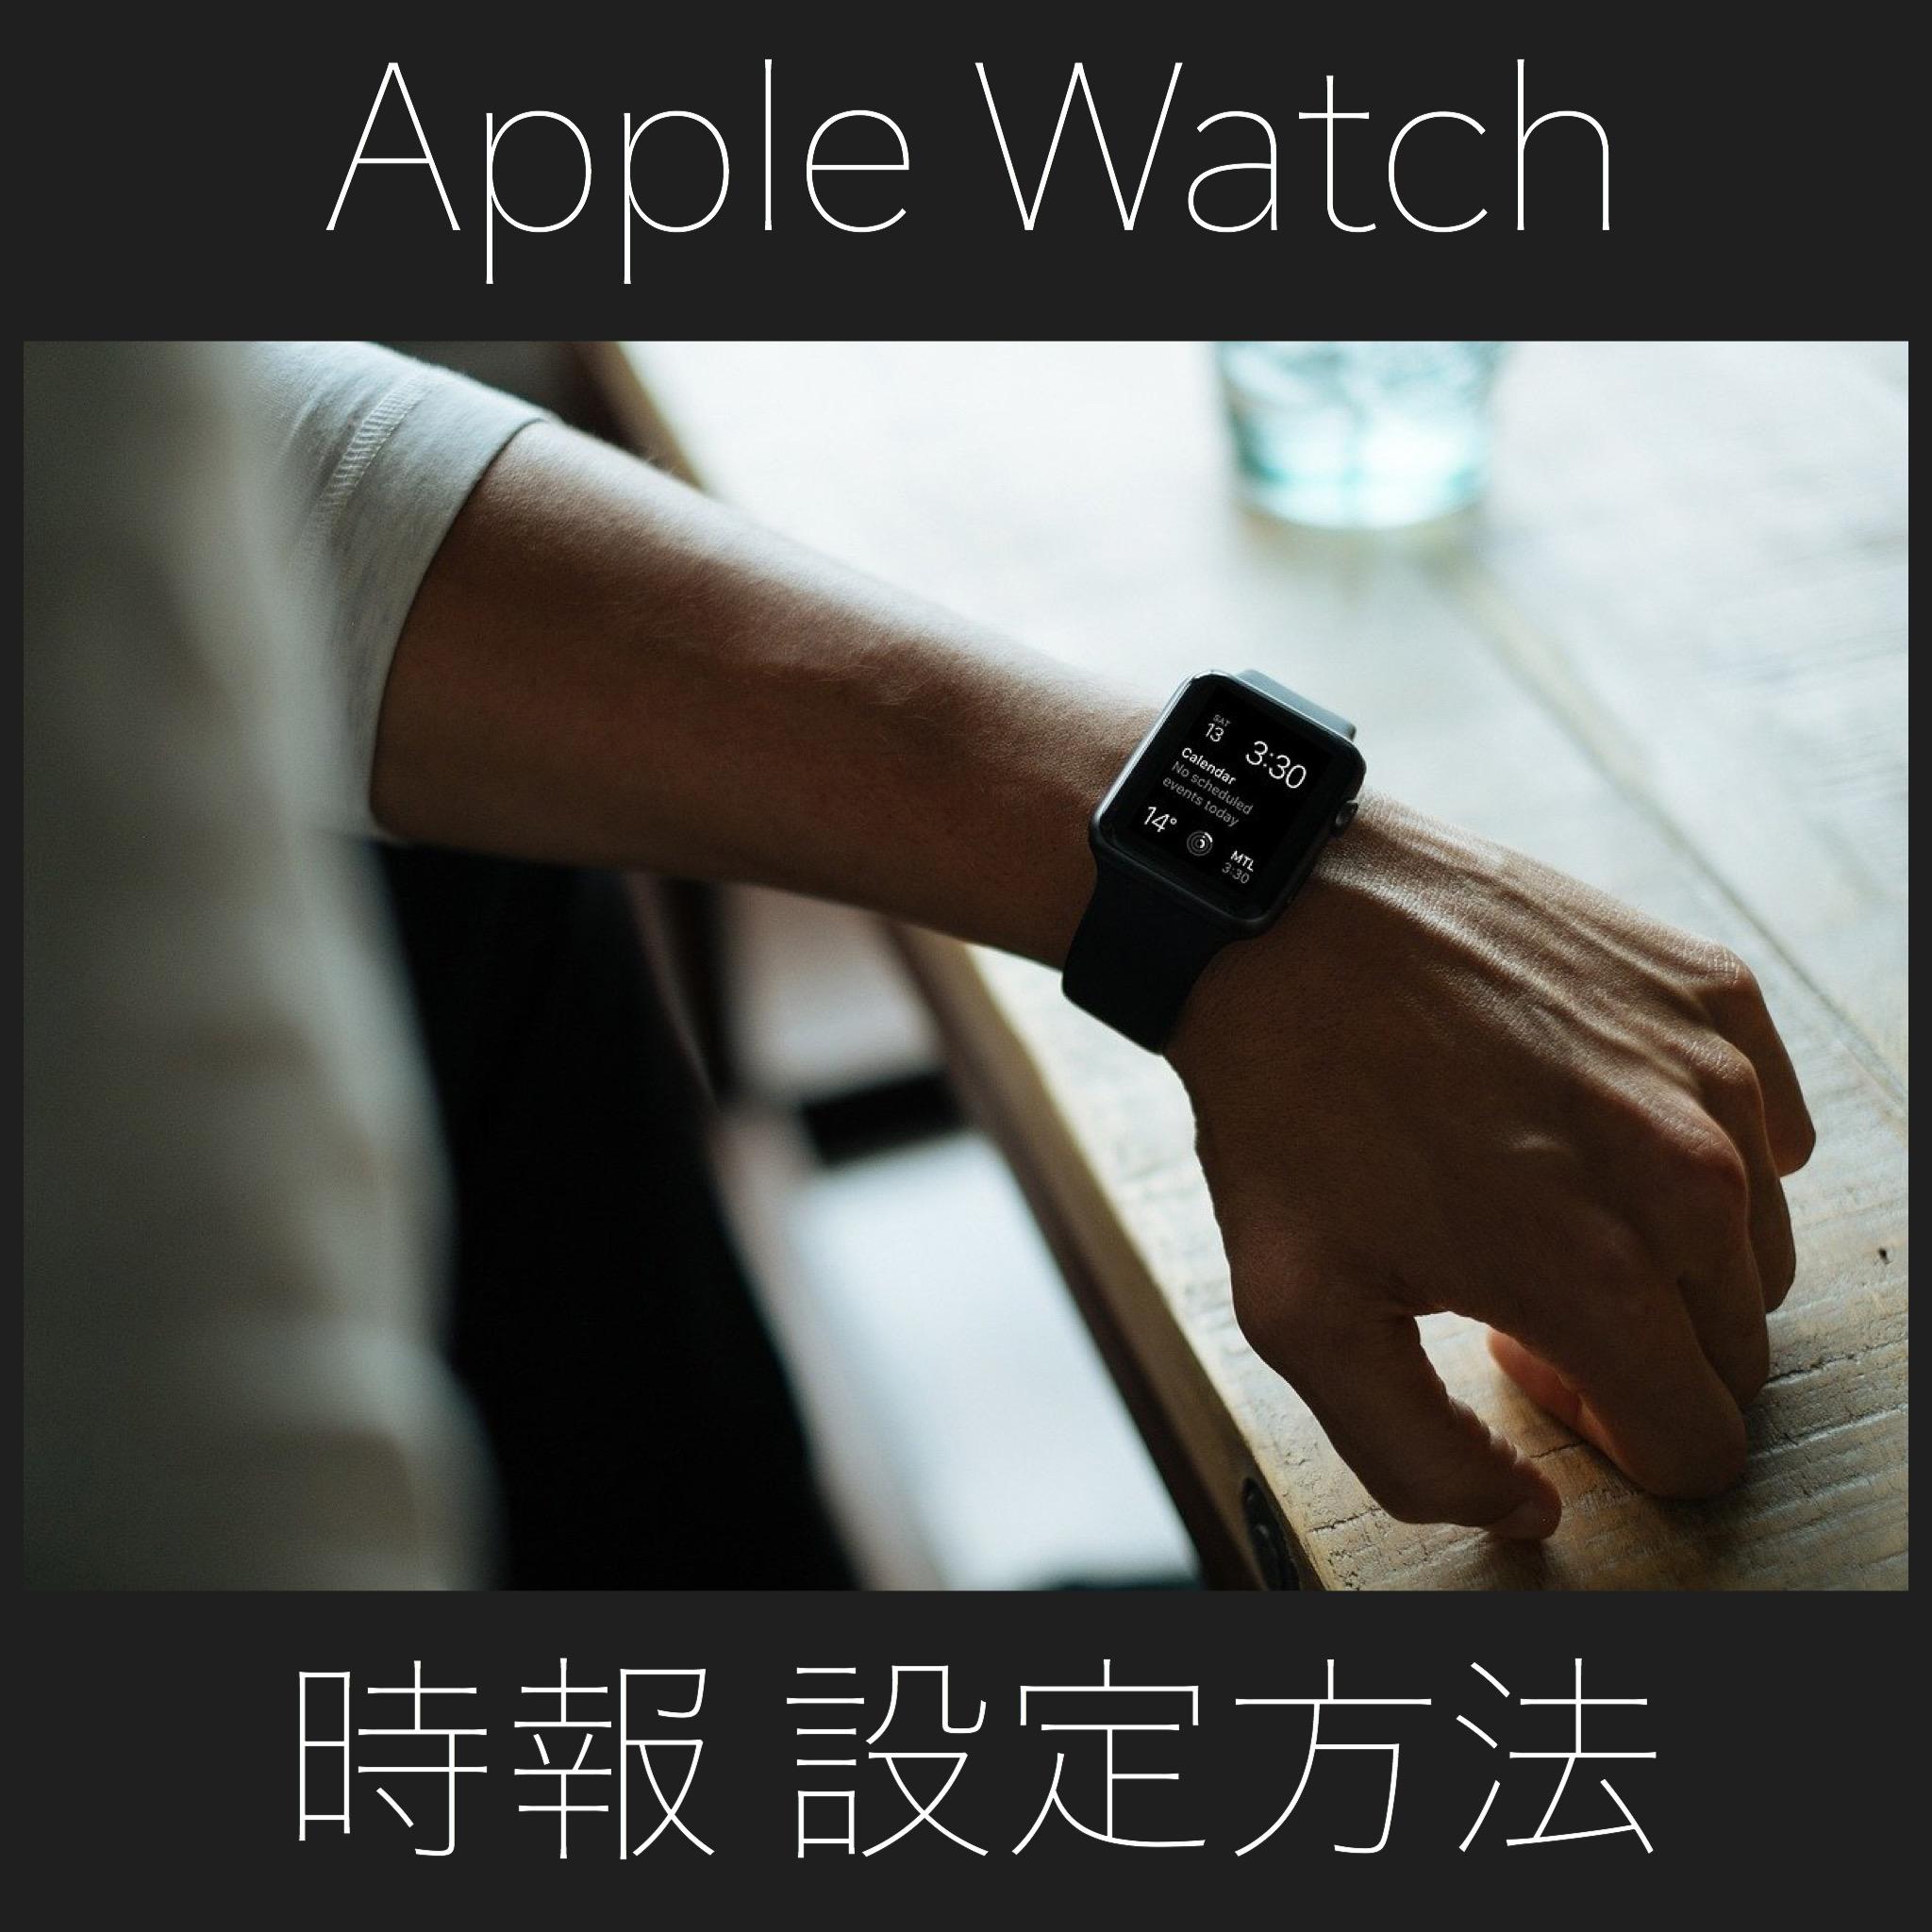 Apple Watchで時報を設定する方法